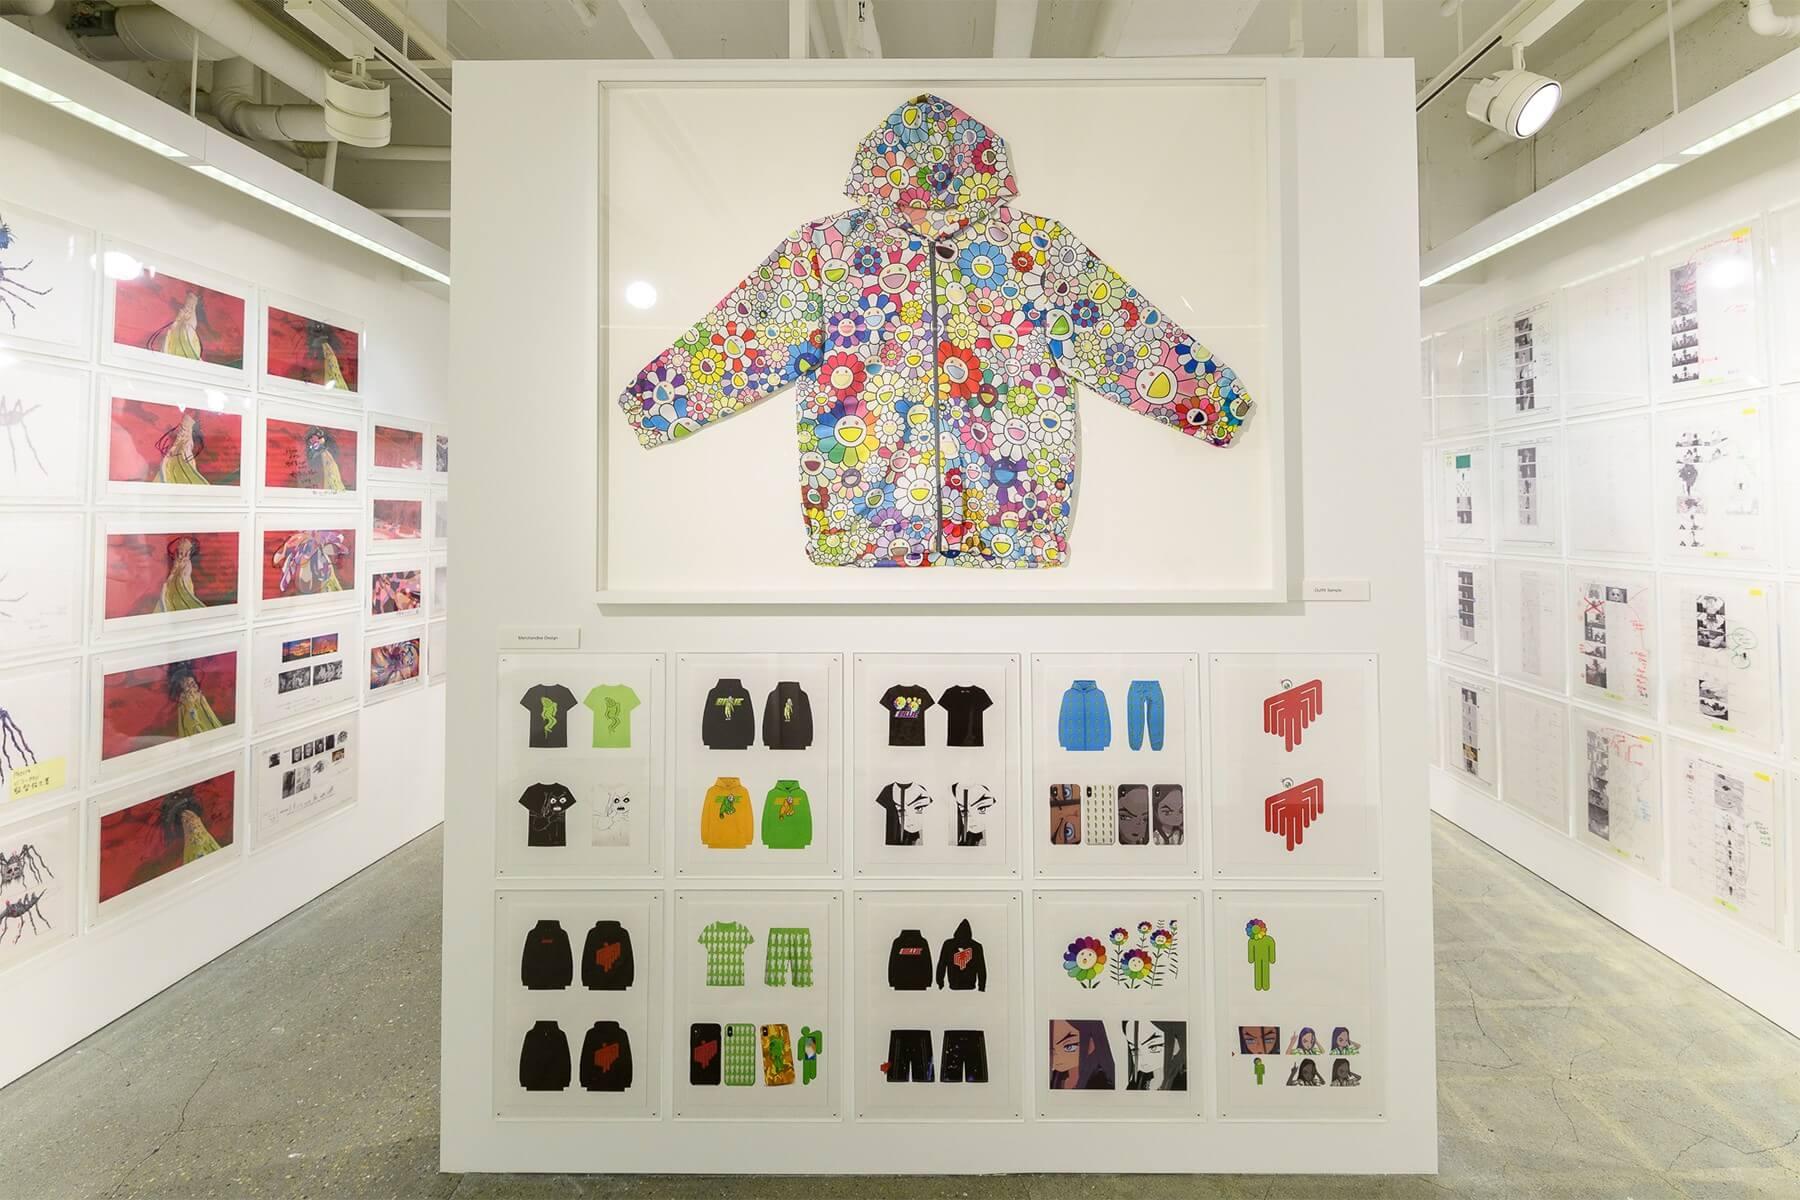 exposición en Animanga Zingaro Gallery